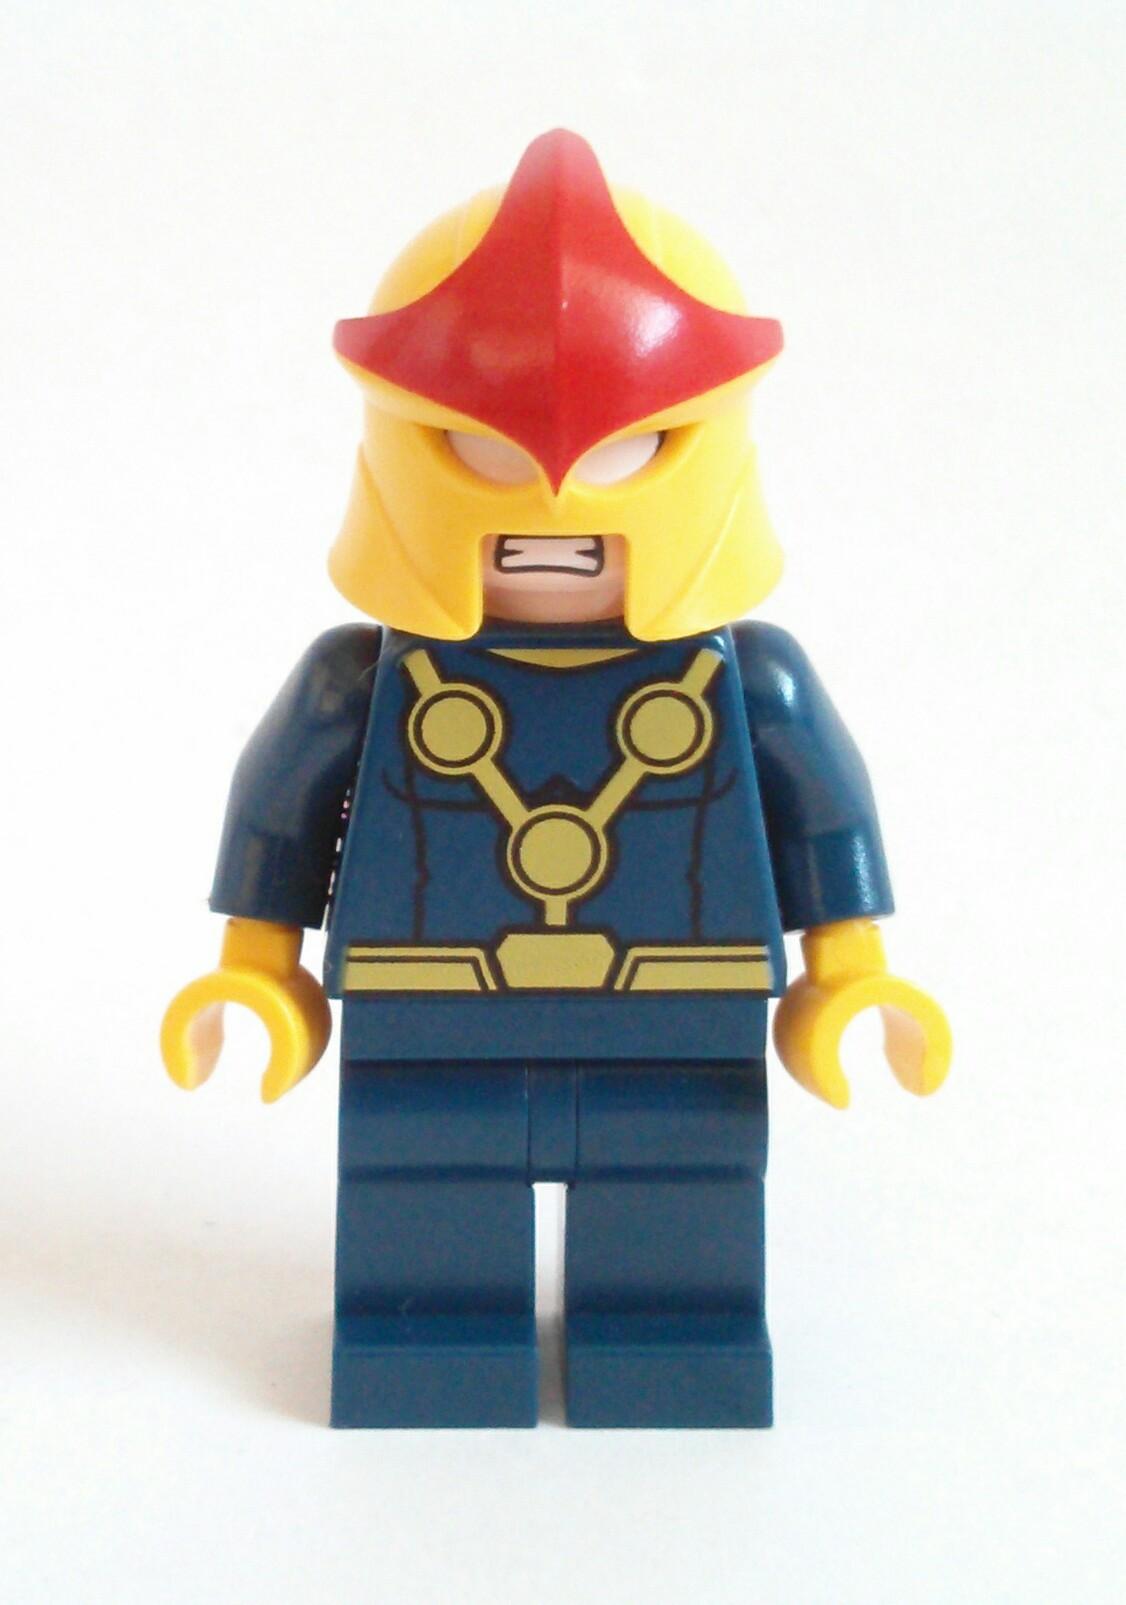 Nova Ultimate Spider-Man Lego Minifigure